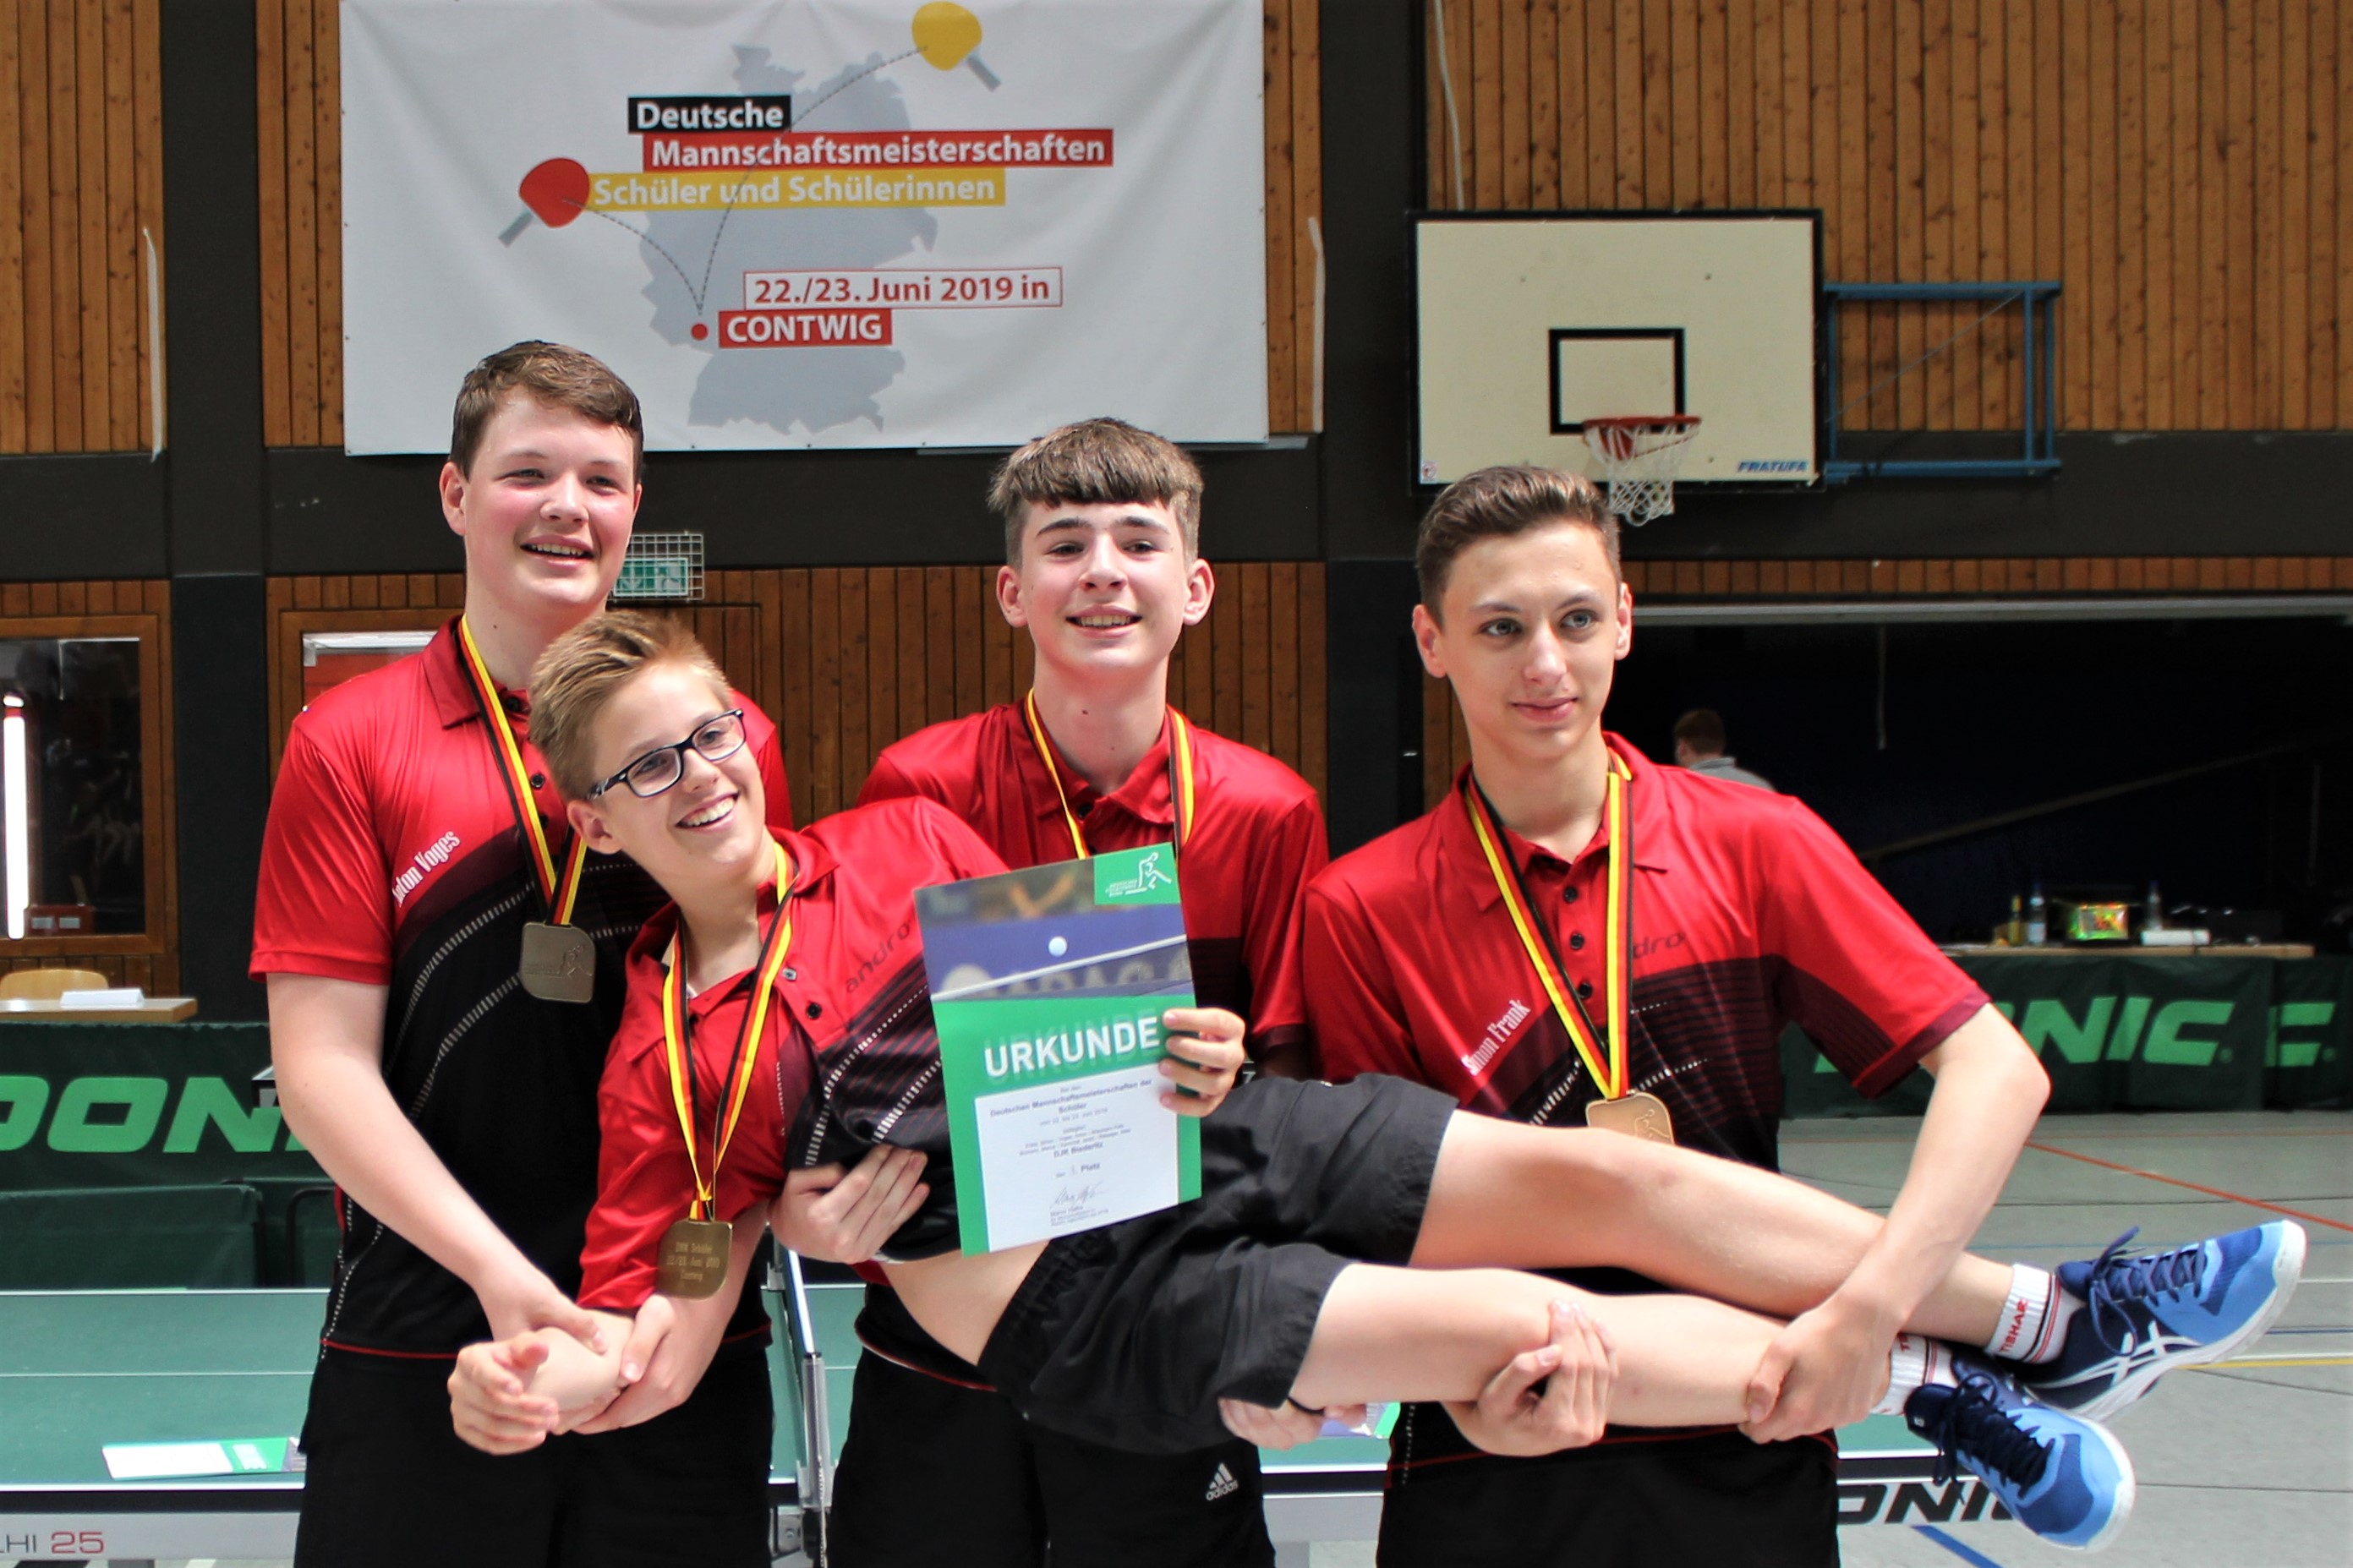 DJK Jungen 15 mit sensationellem Dritten Platz bei den Deutschen Mannschaftsmeisterschaften